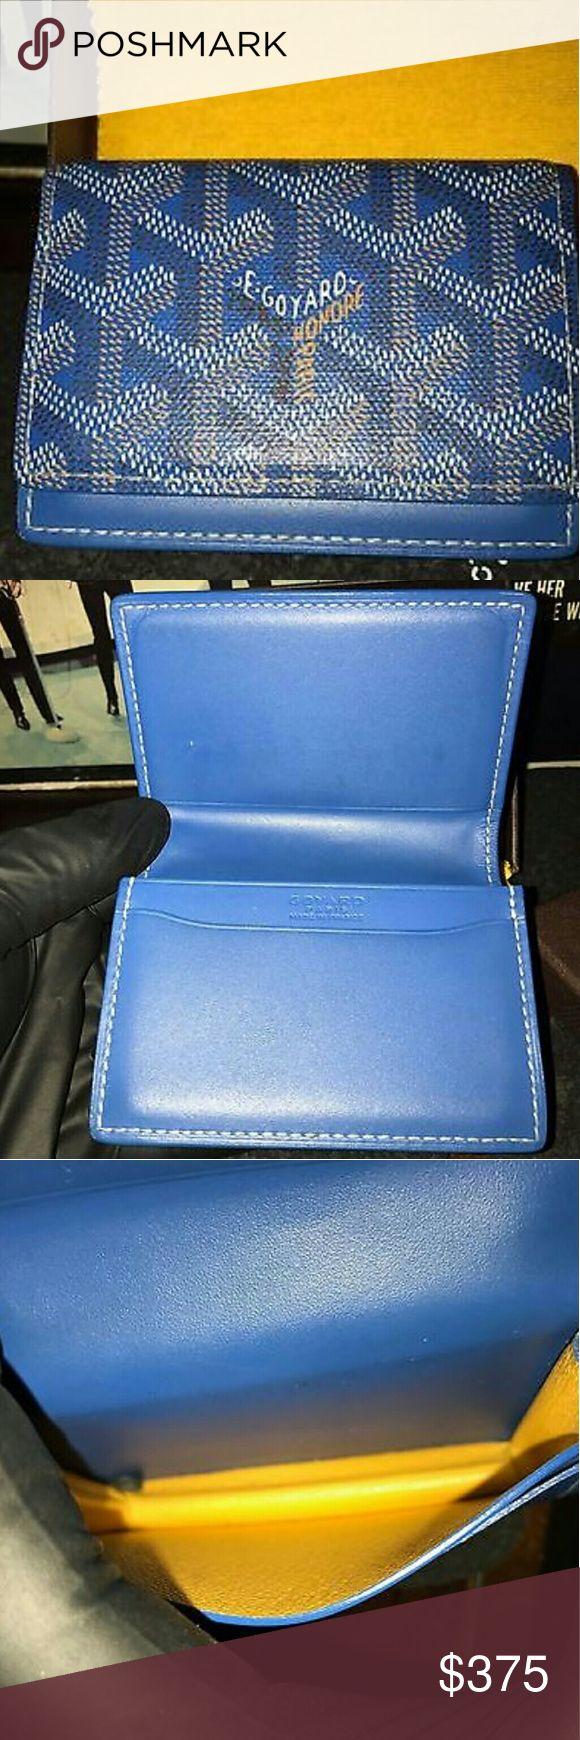 Goyard Men's Wallet New Mens Authentic Goyard ID Credit Card Carrier Wallet Blue. W Reciept Goyard Other